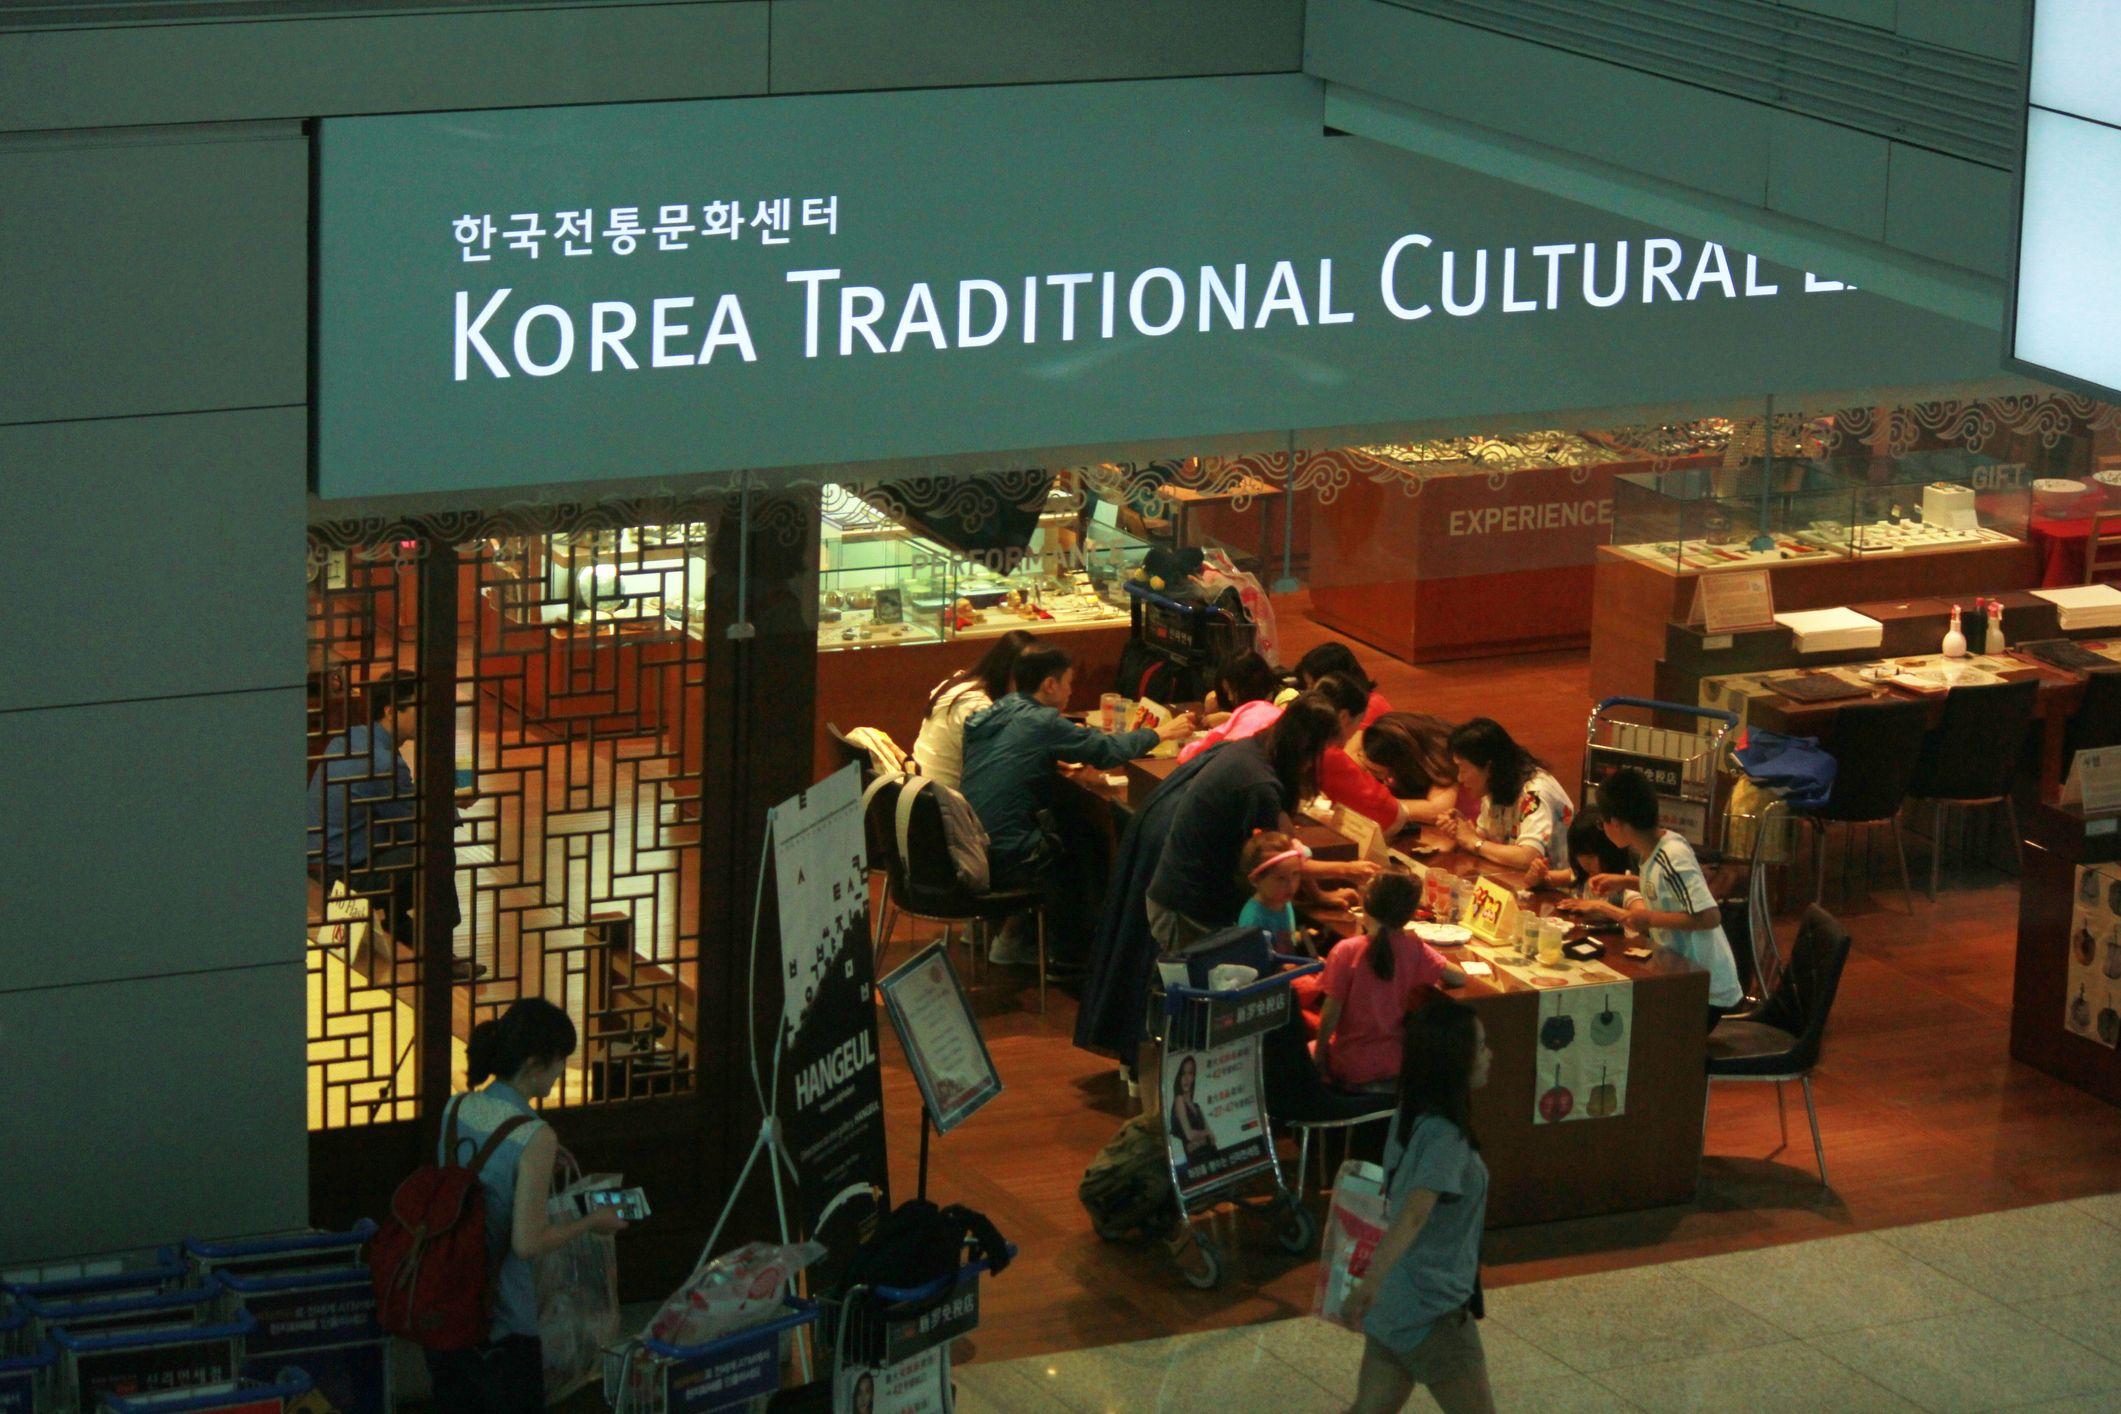 3 Incheon International Airport